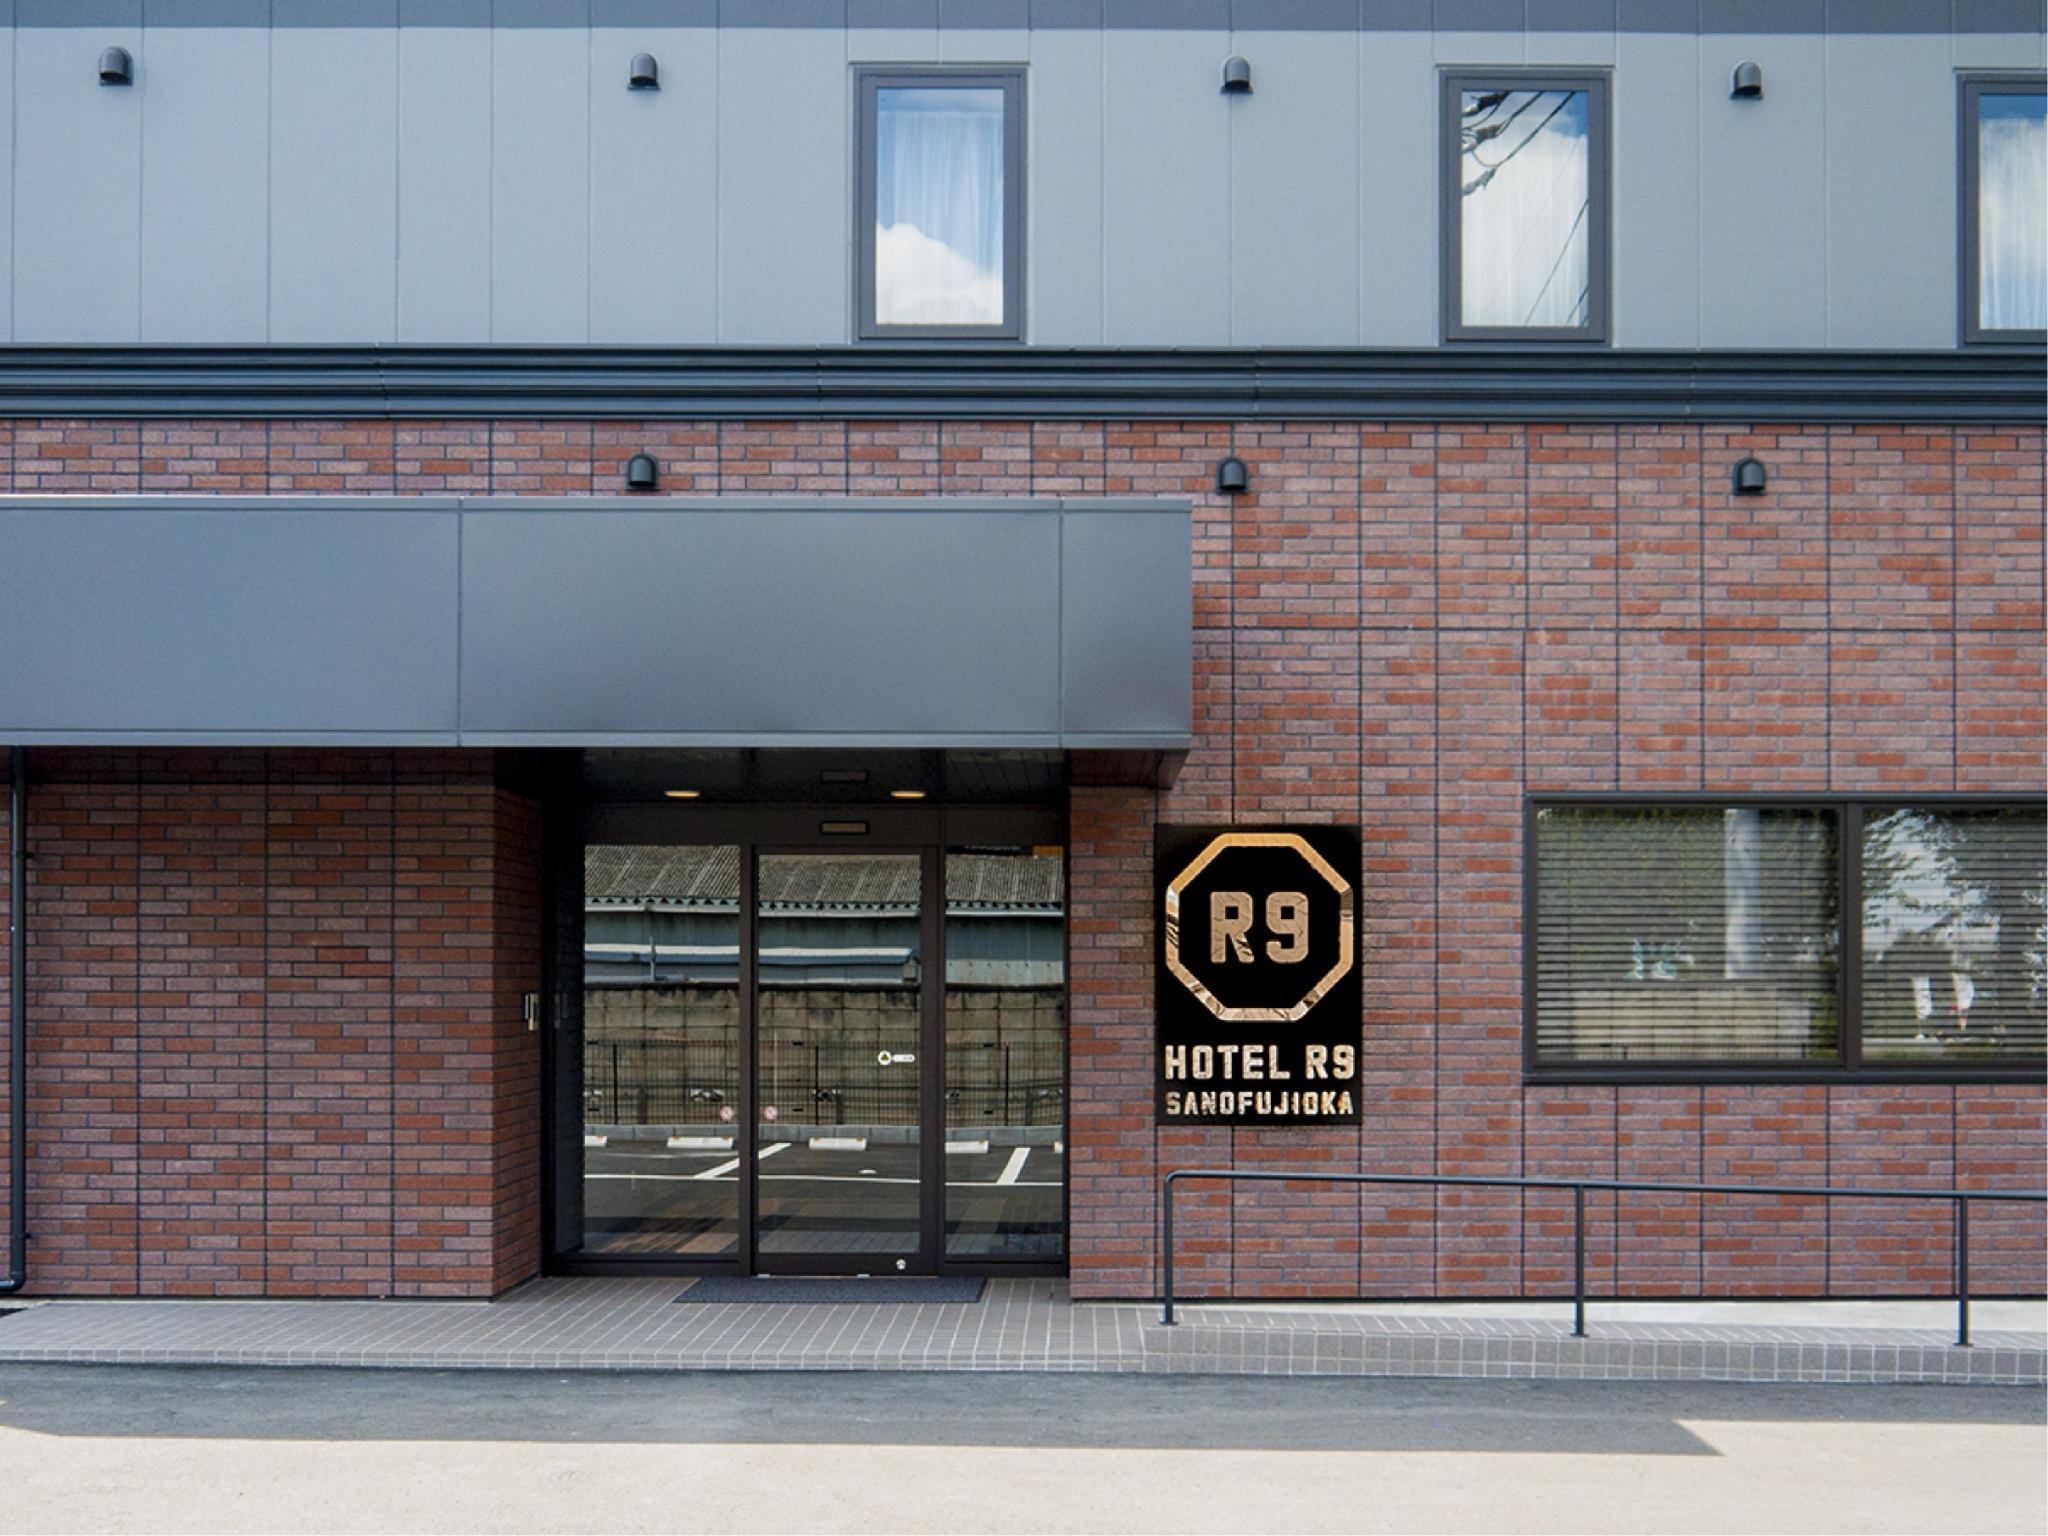 HOTEL R9 SANOFUJIOKA